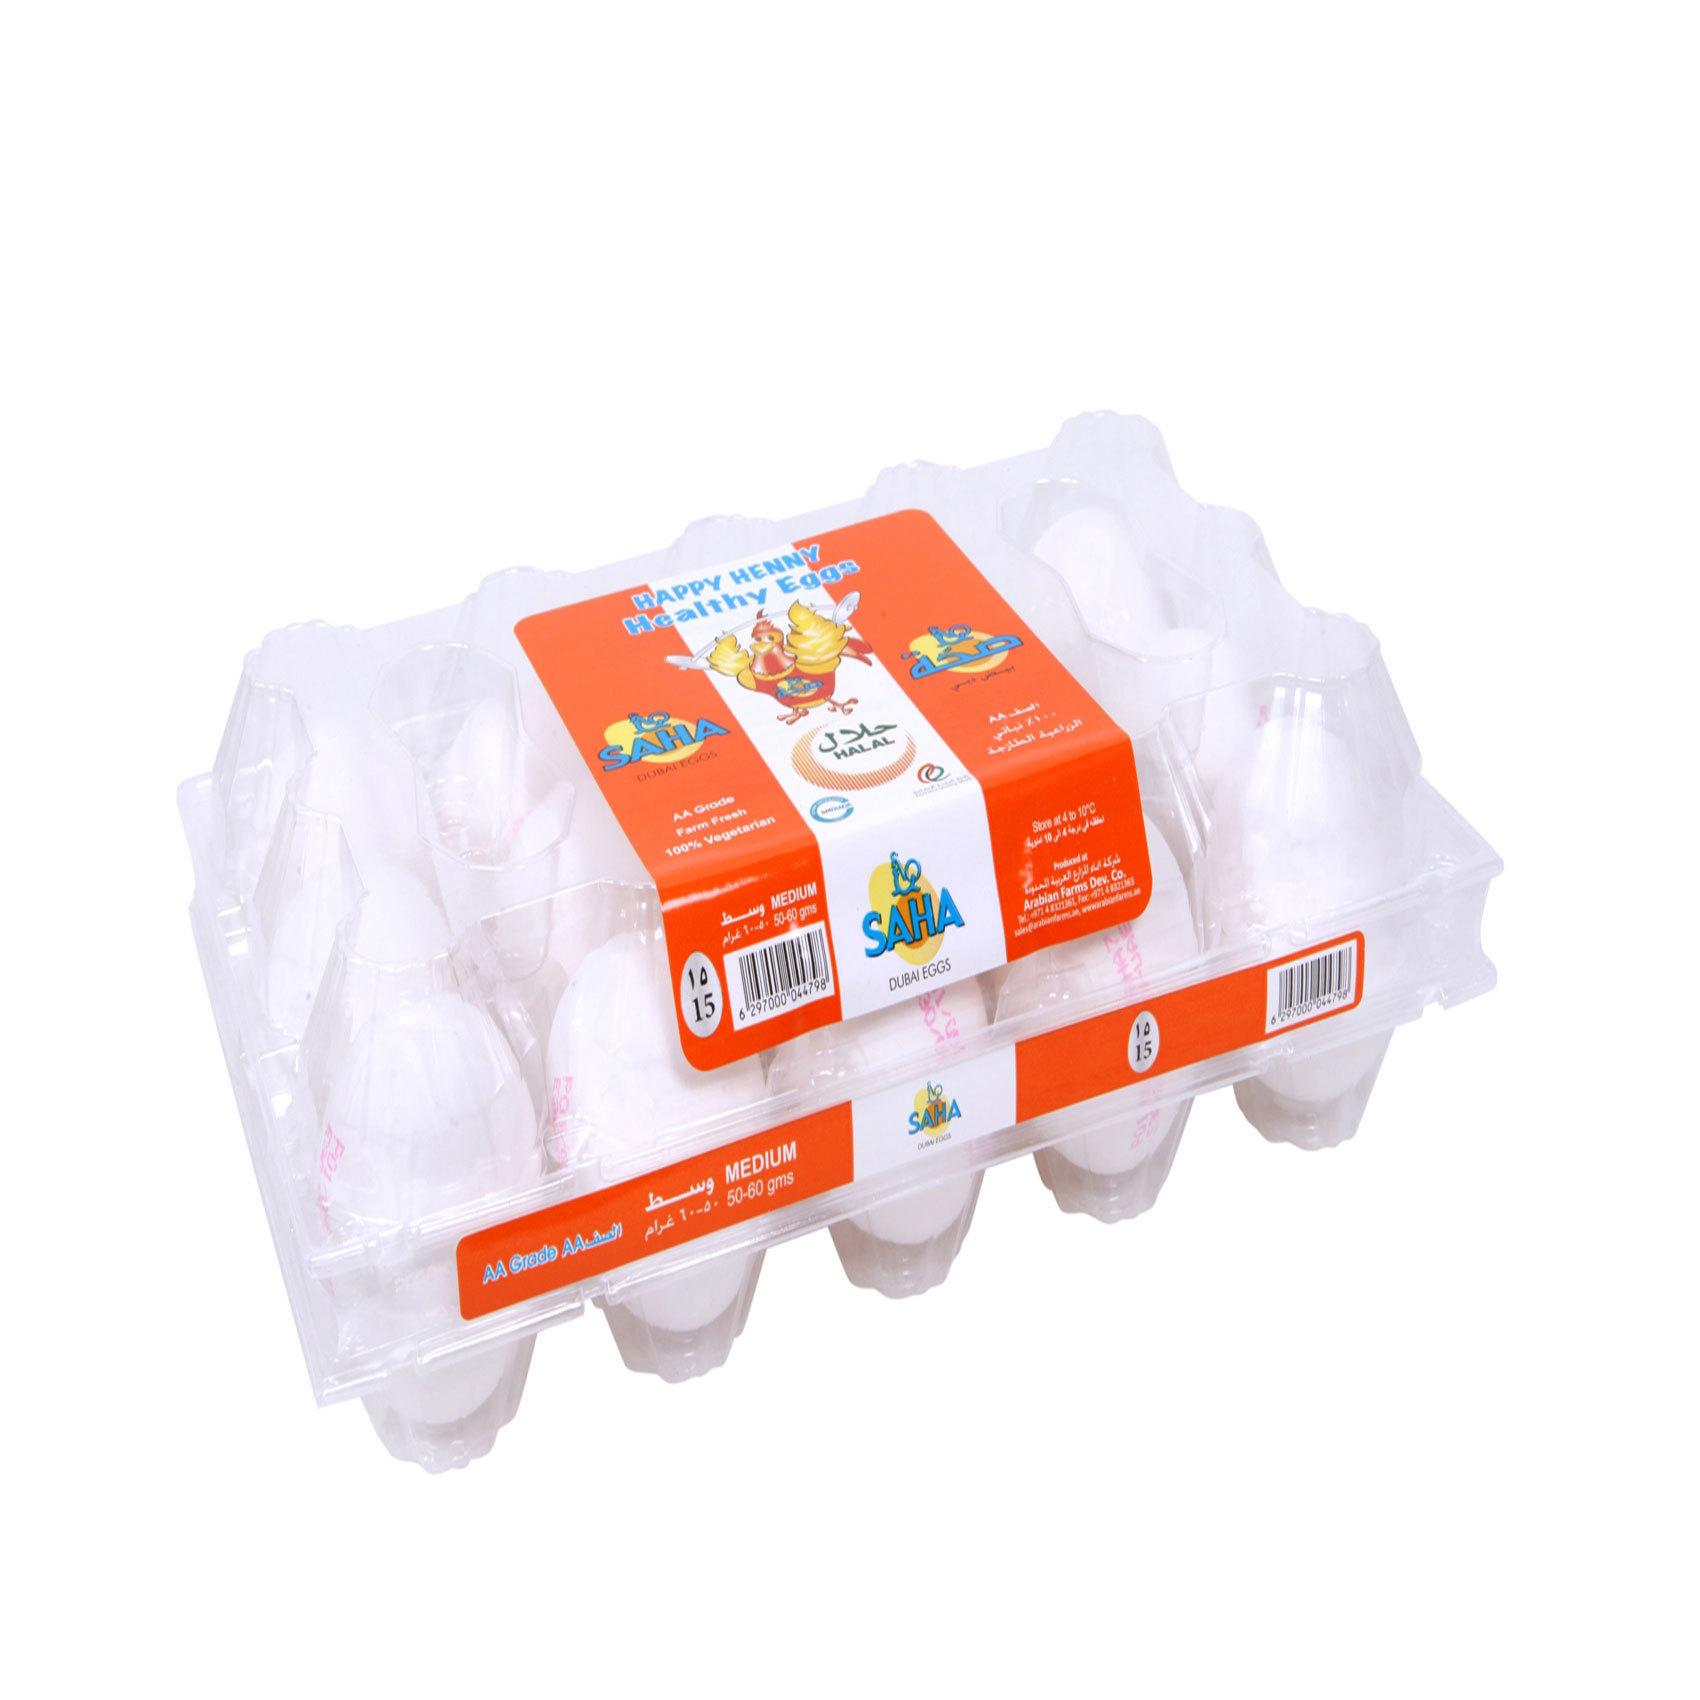 SAHA WHITE EGGS MEDIUMX15